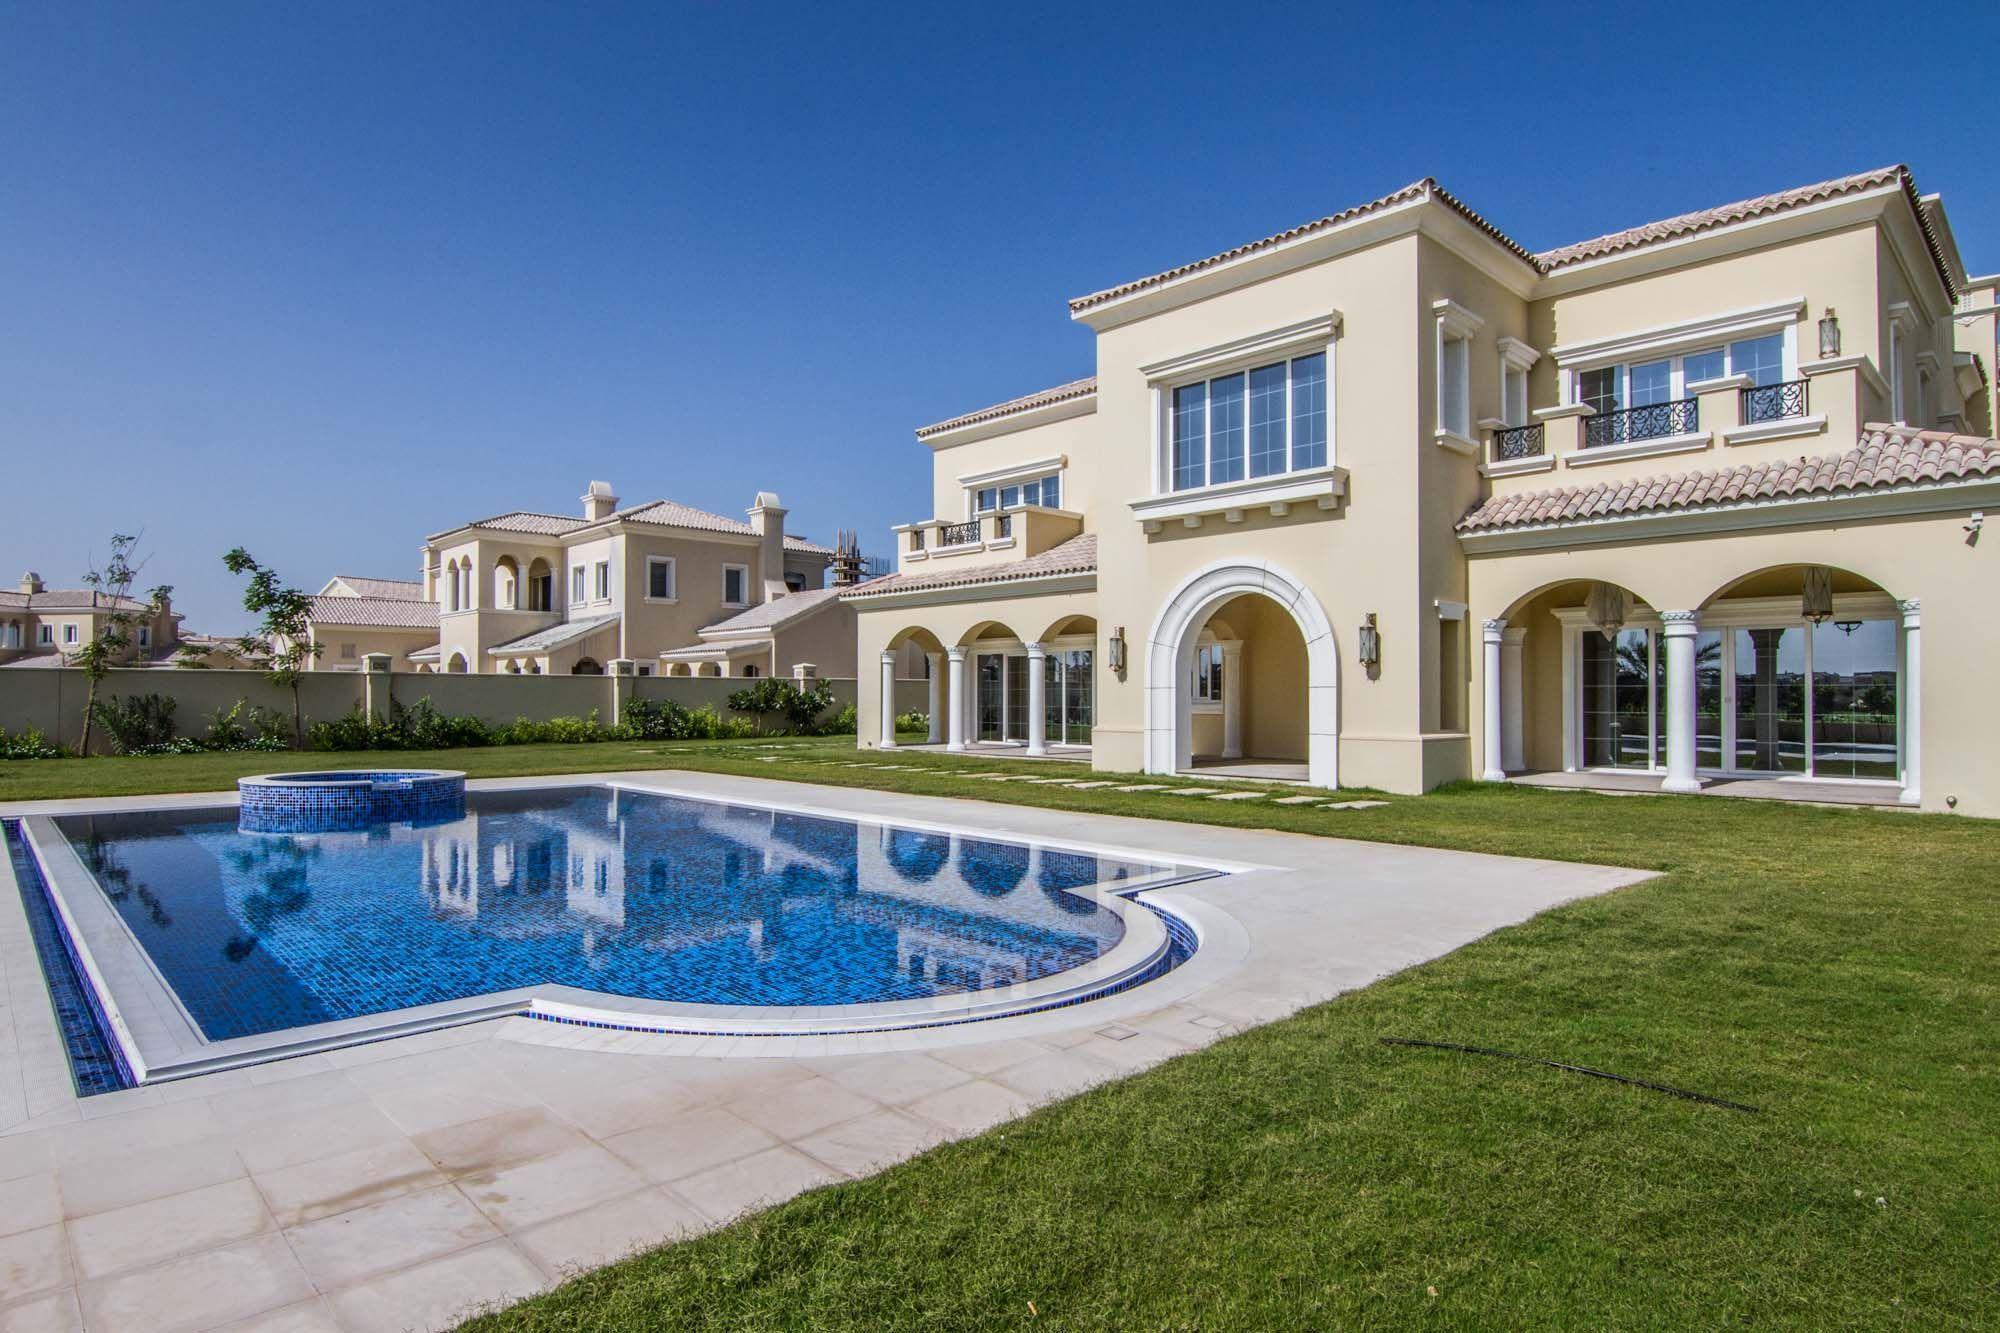 Top 5 Villa Communities in Dubai